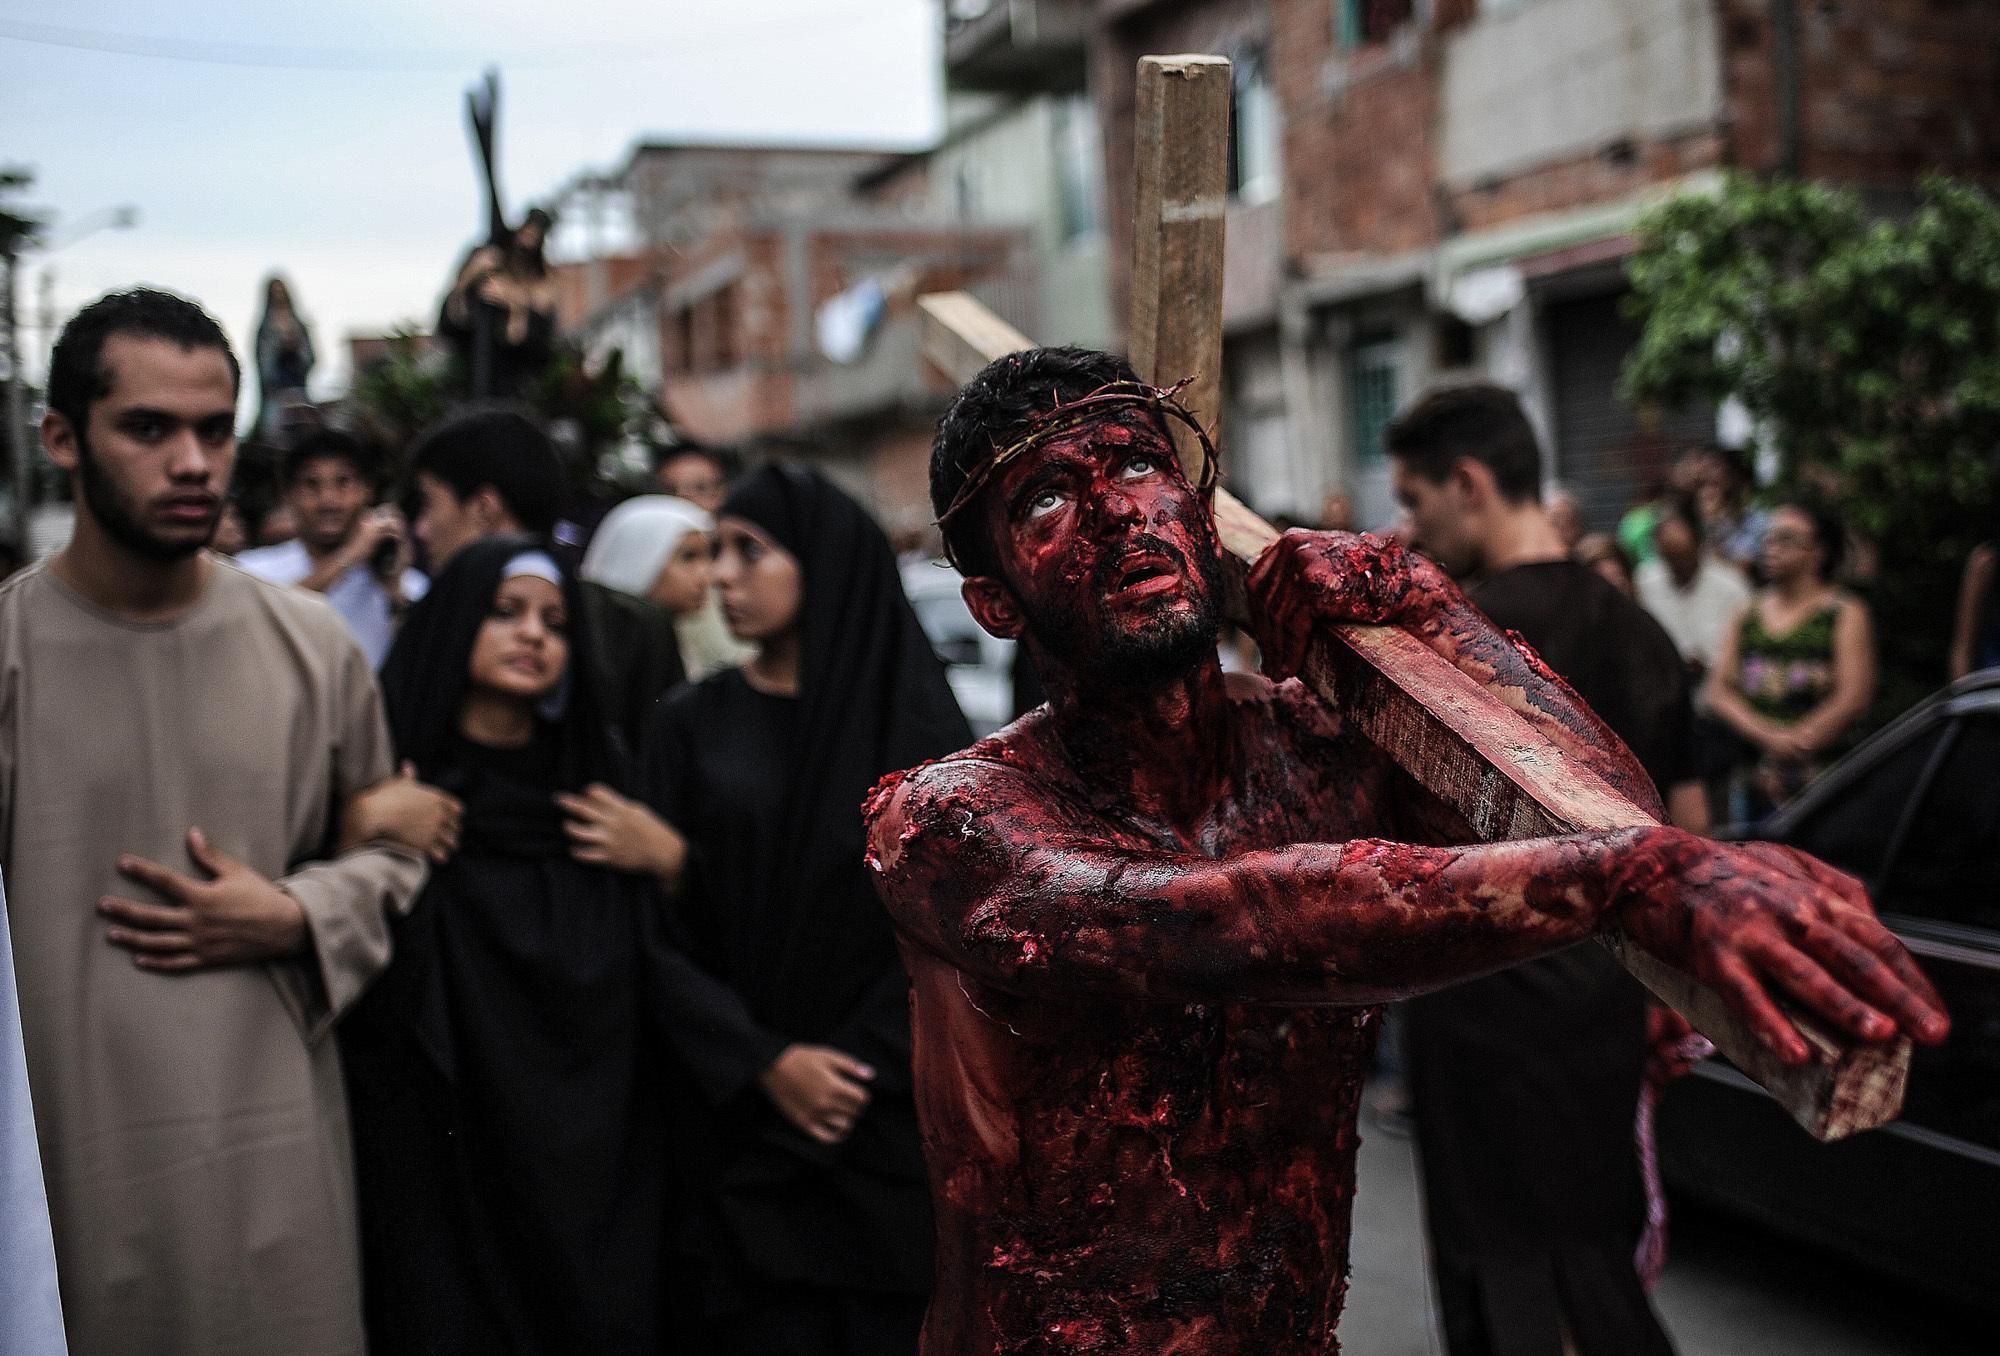 photos of a fake jesus carrying a cross around rio u0027s slums vice